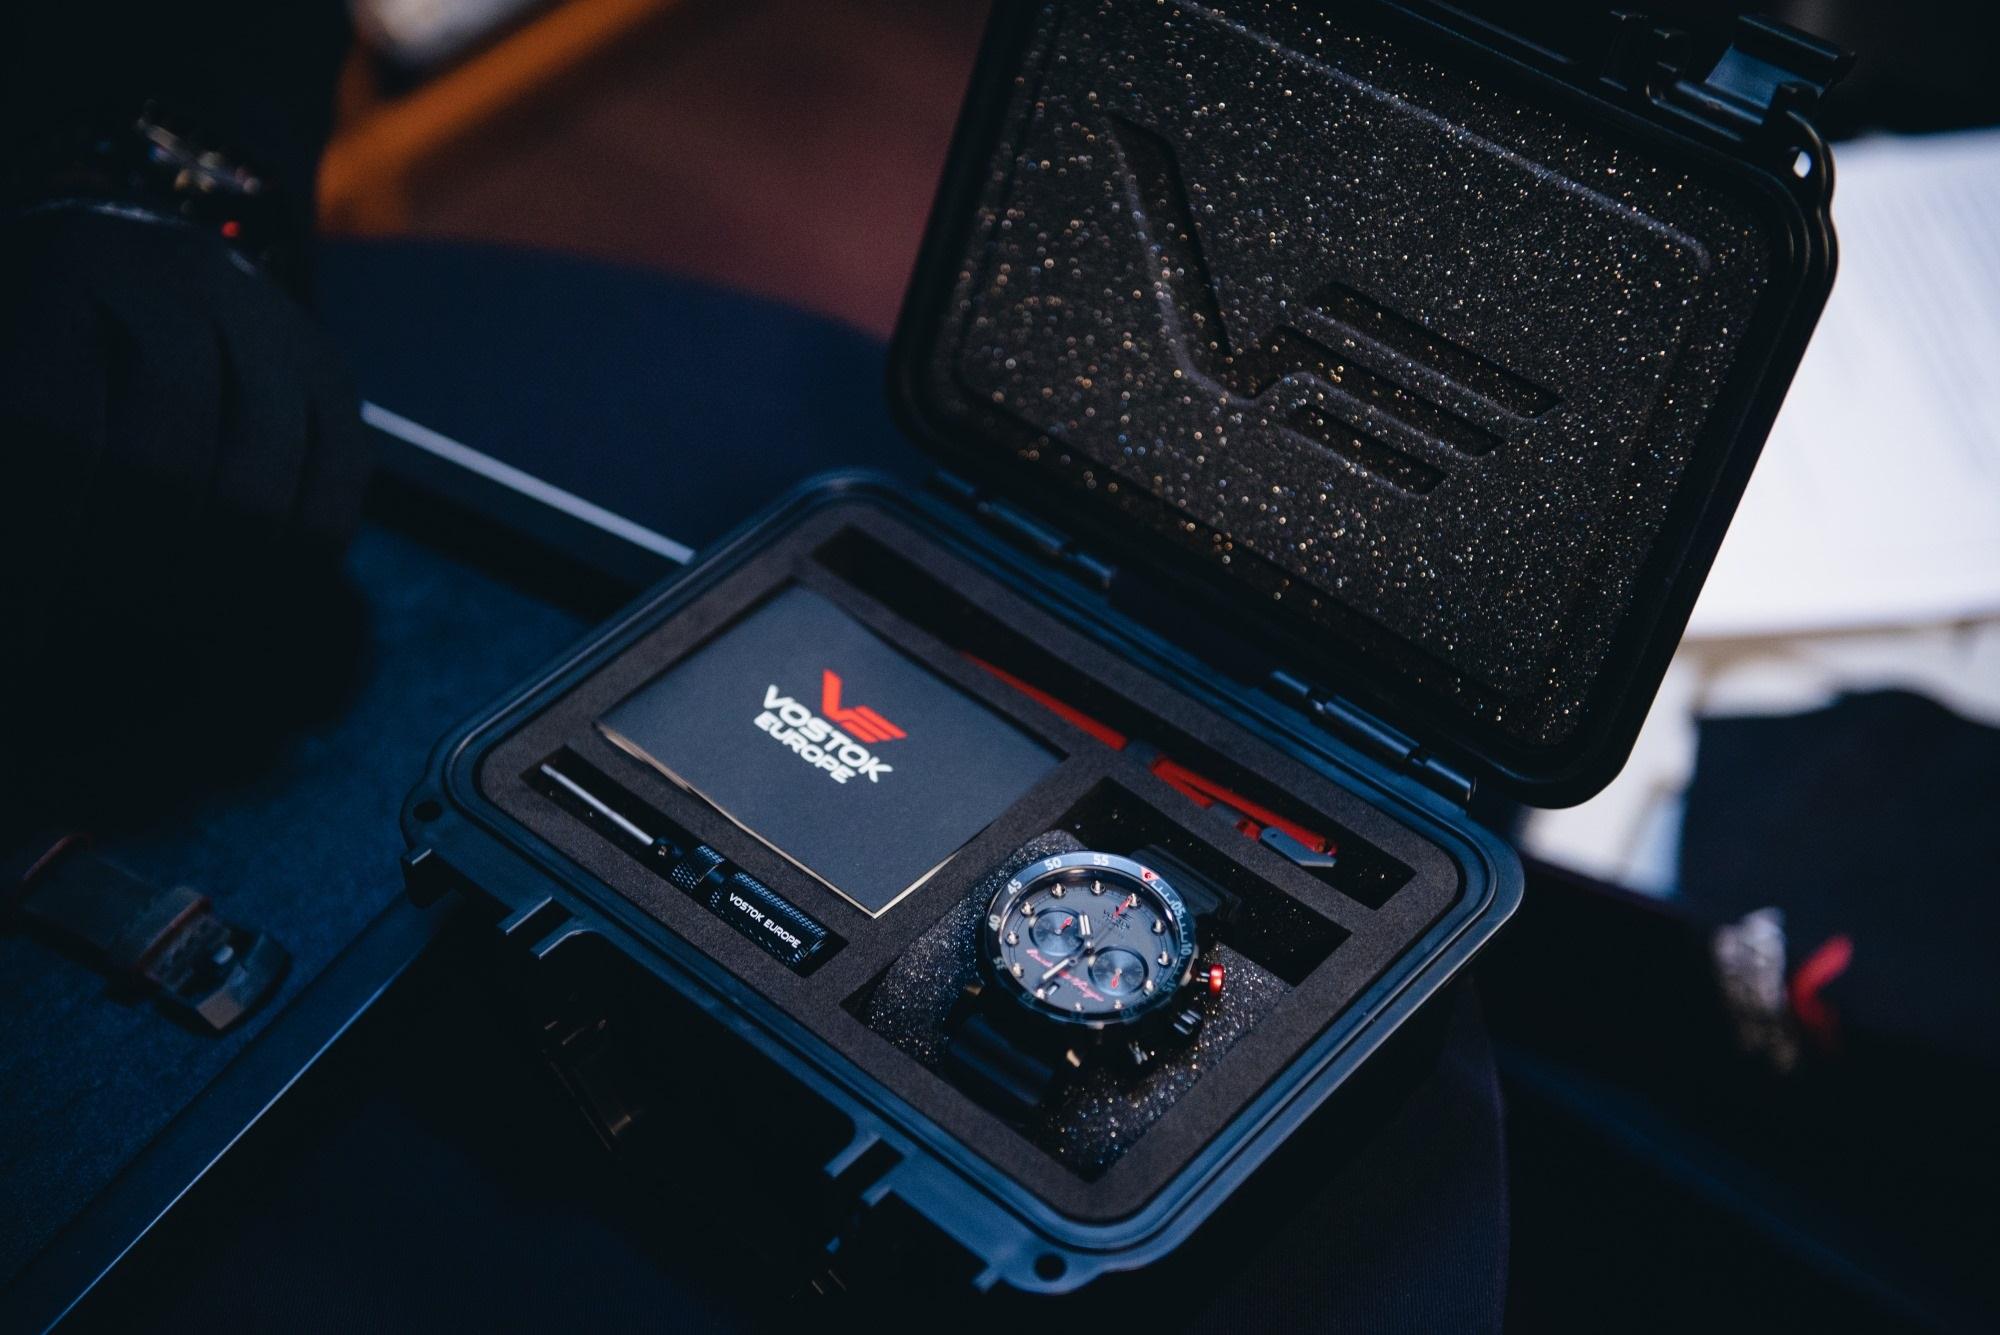 Zegarek męski Vostok Europe ssn 571 VK64-571J431 - duże 6